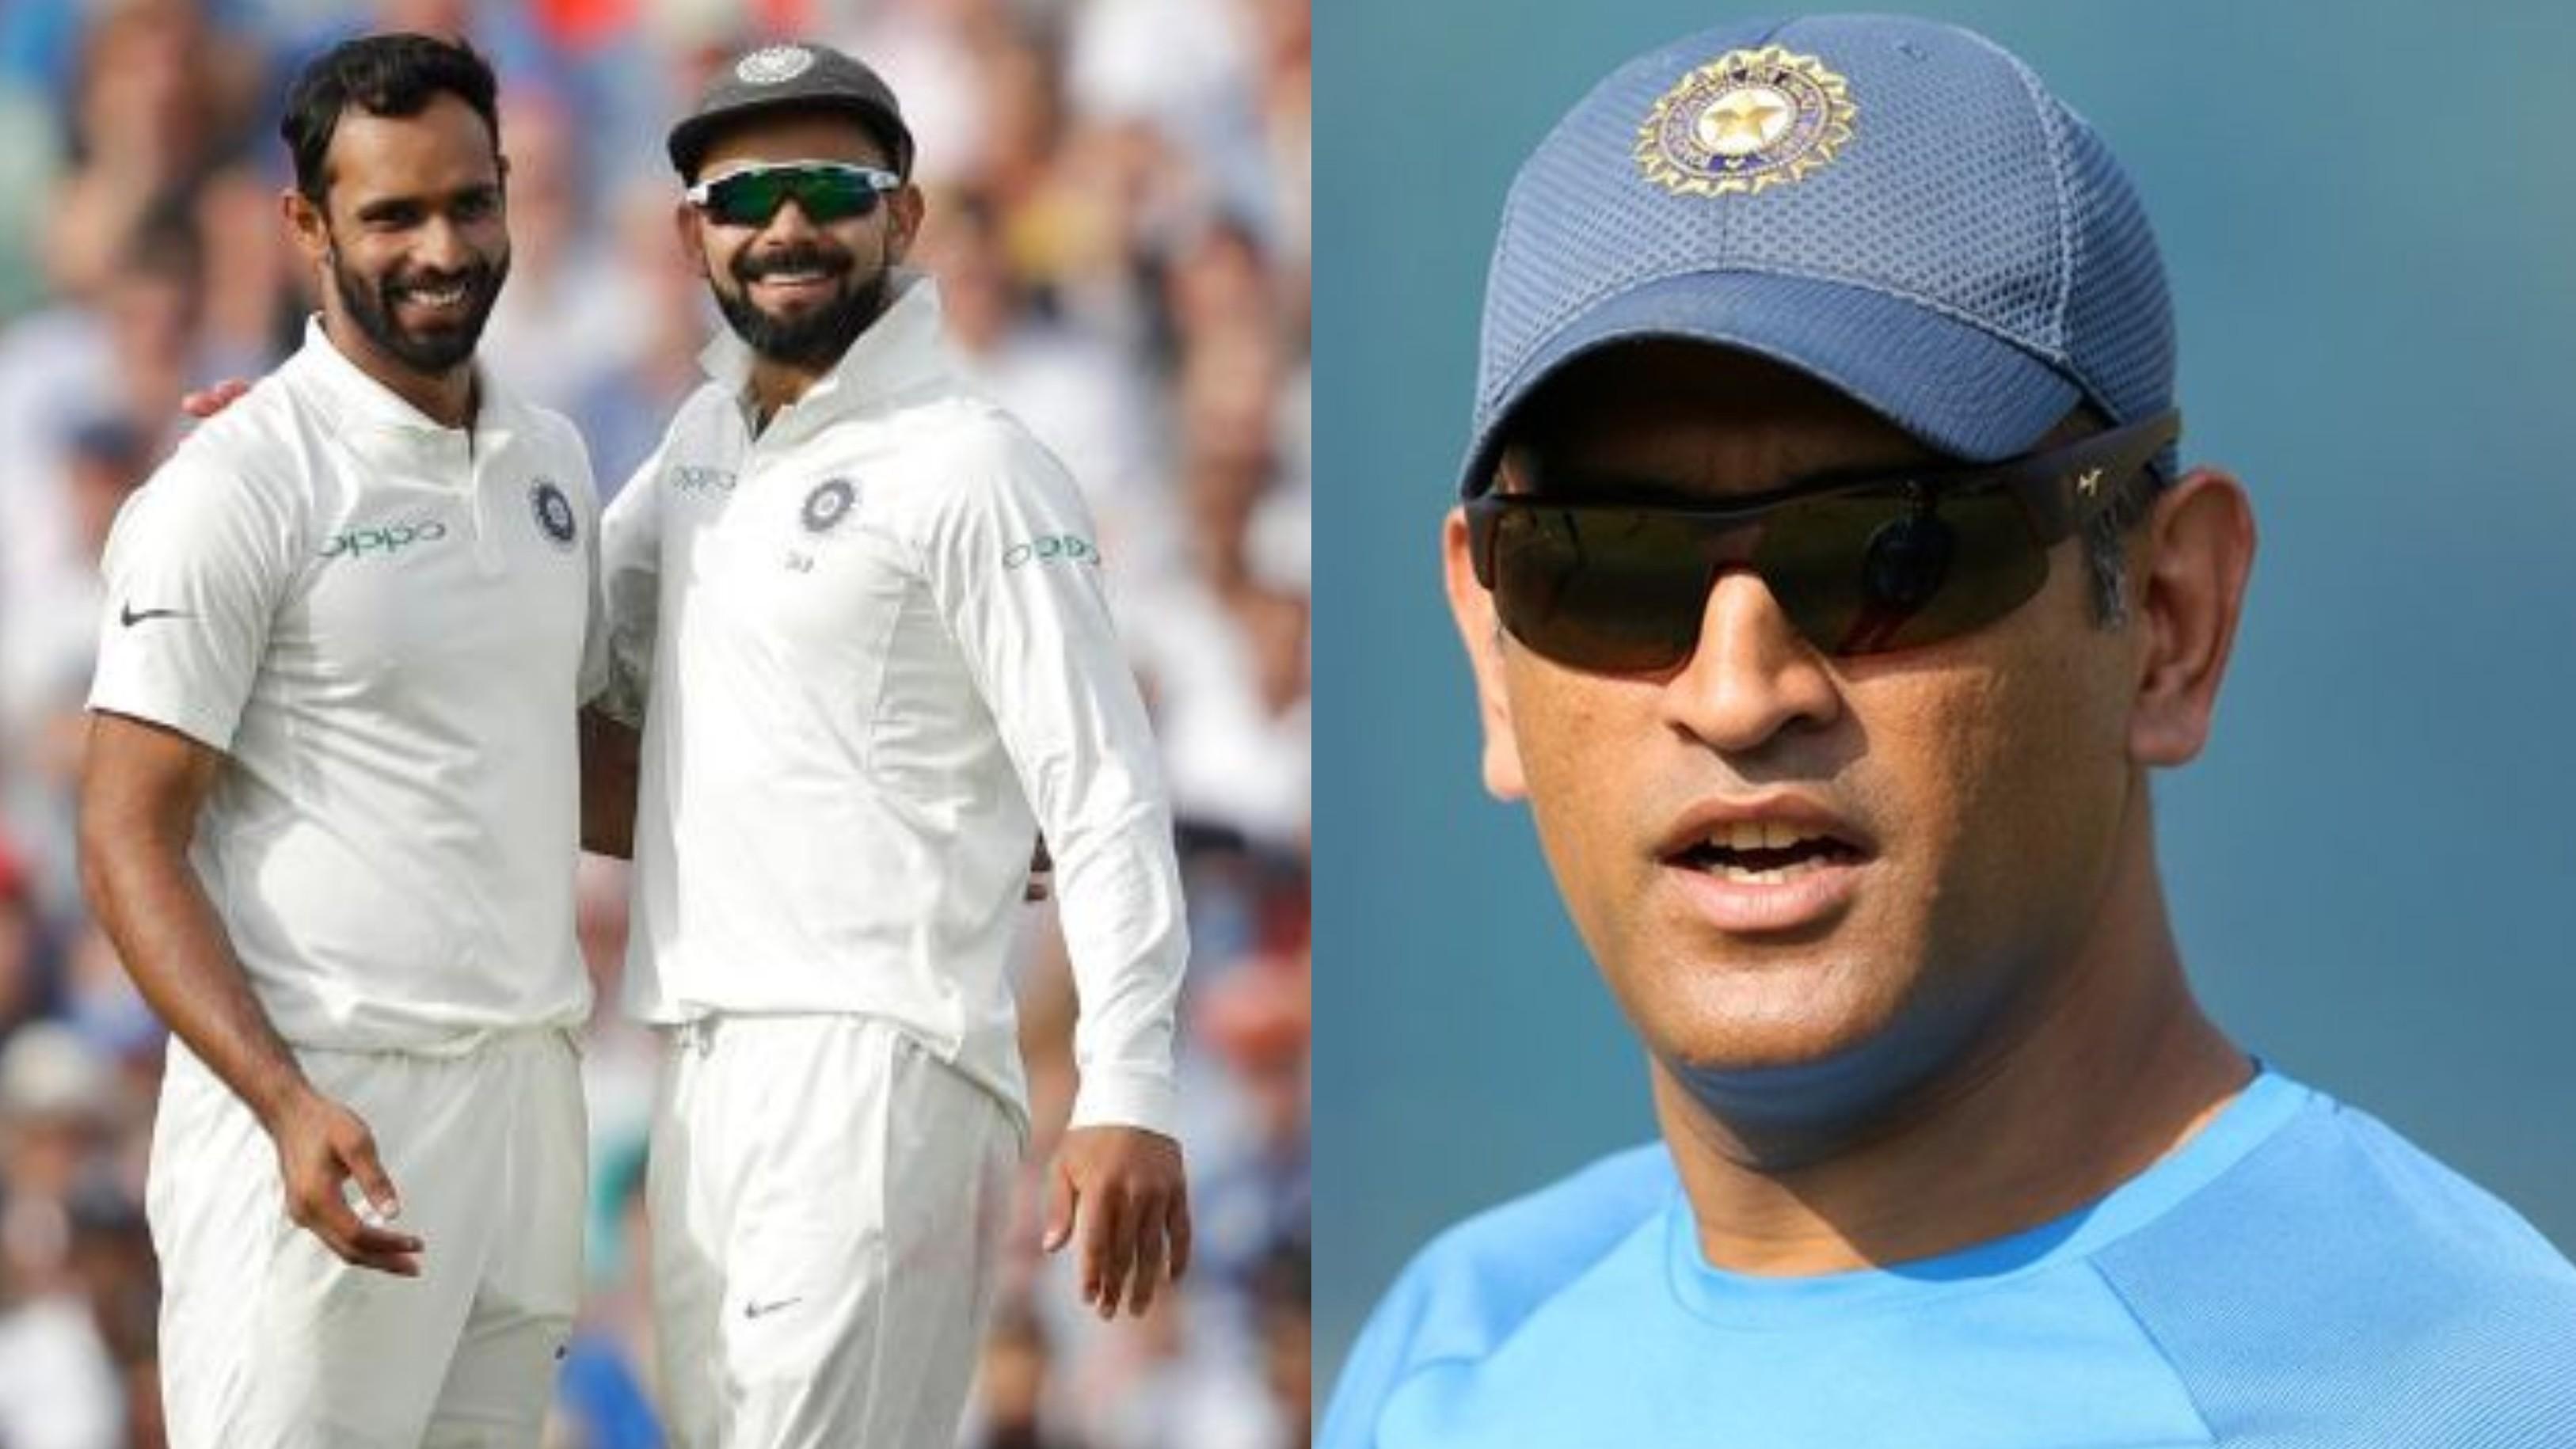 Hanuma Vihari names his favorite cricketer and chooses best captain from MS Dhoni and Virat Kohli